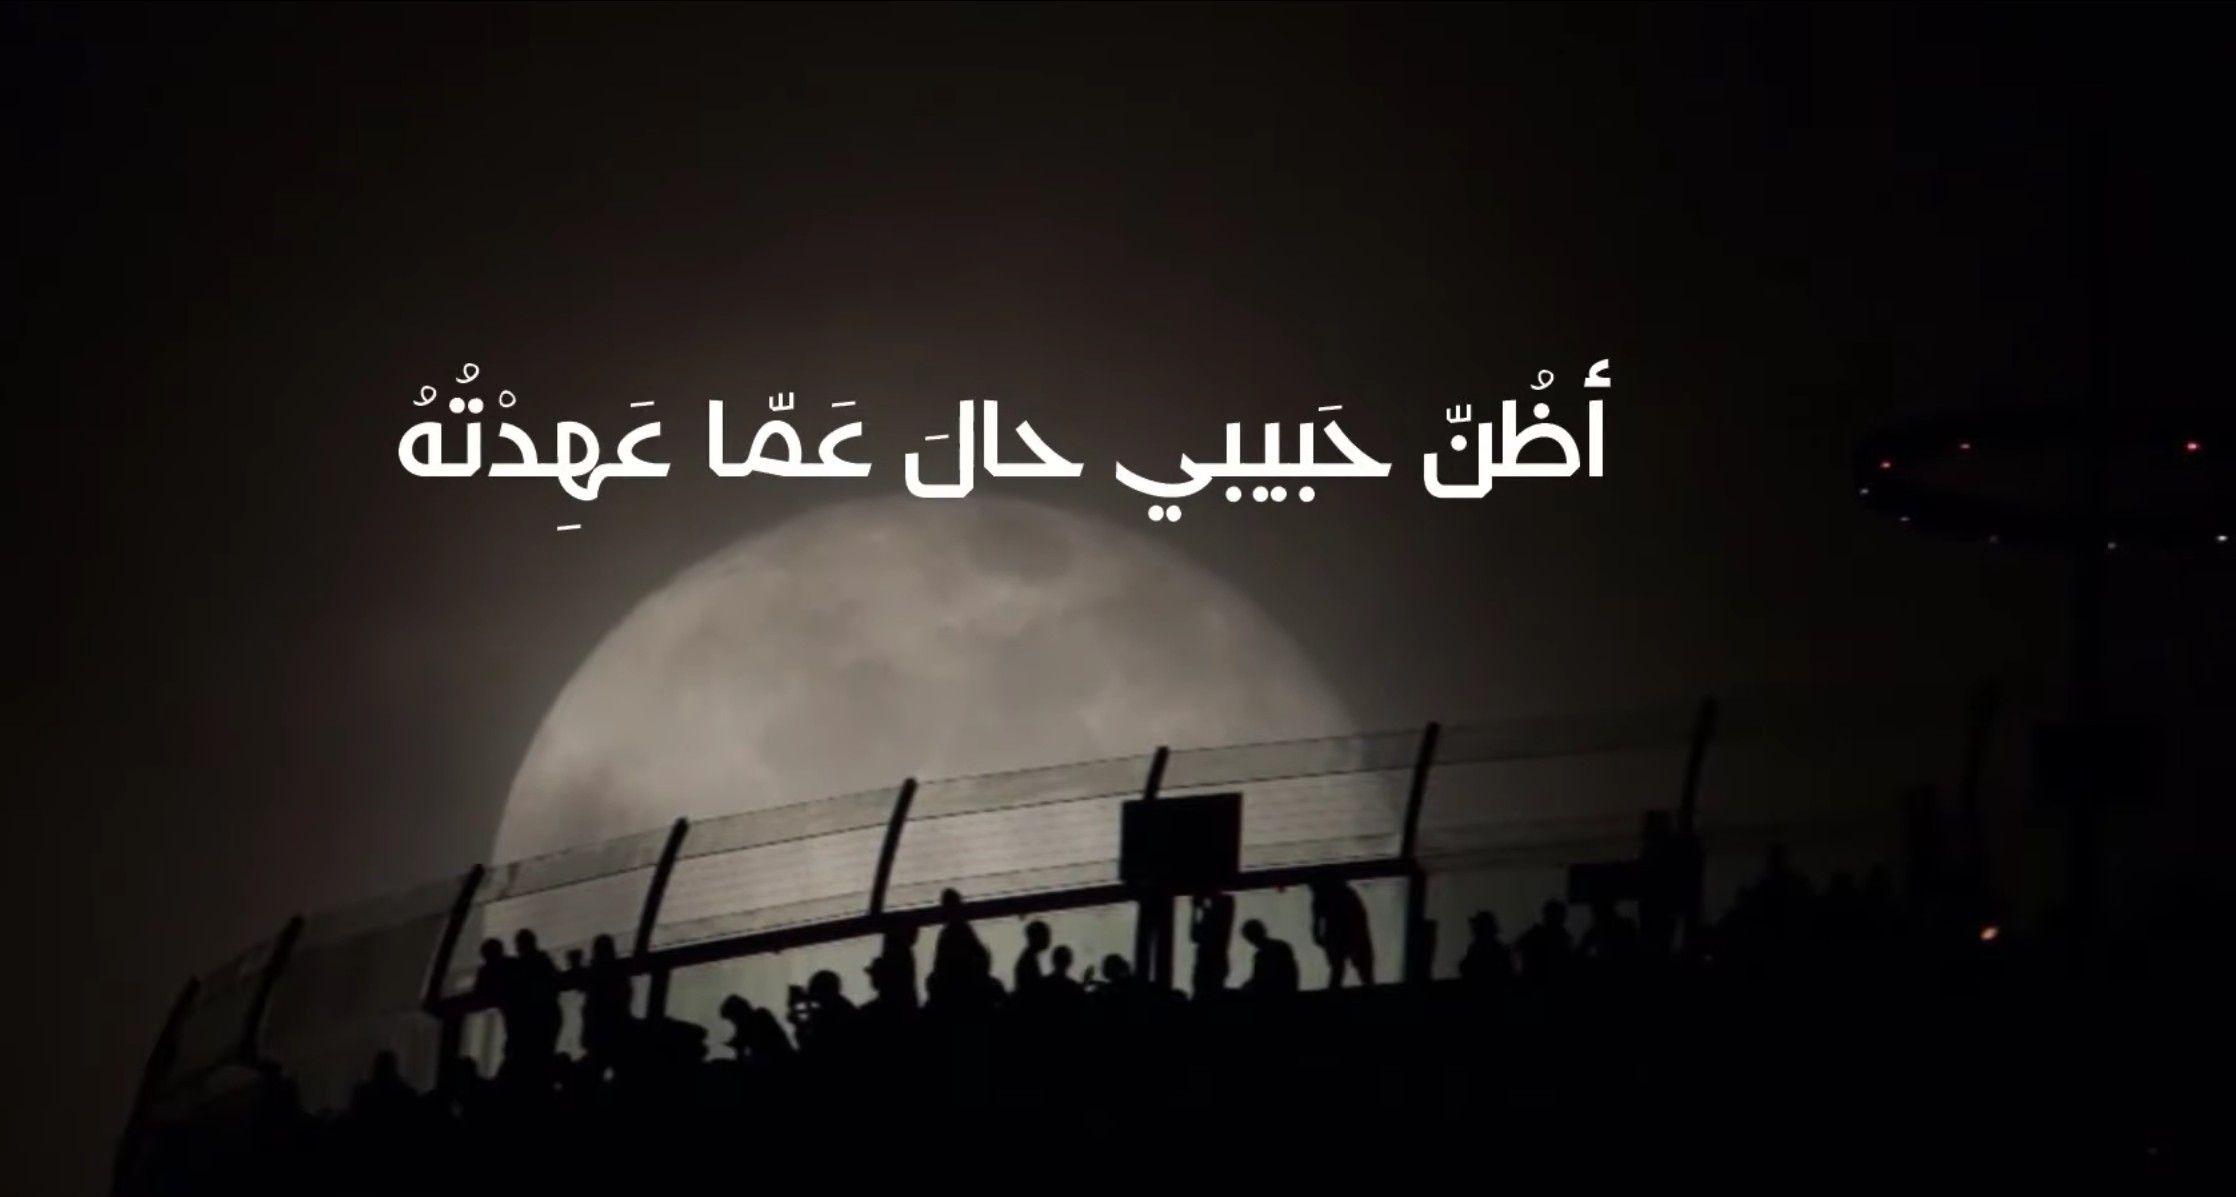 Pin By Rami On يا بيت الشعر يا بيت القصيد Movie Posters Movies Poster